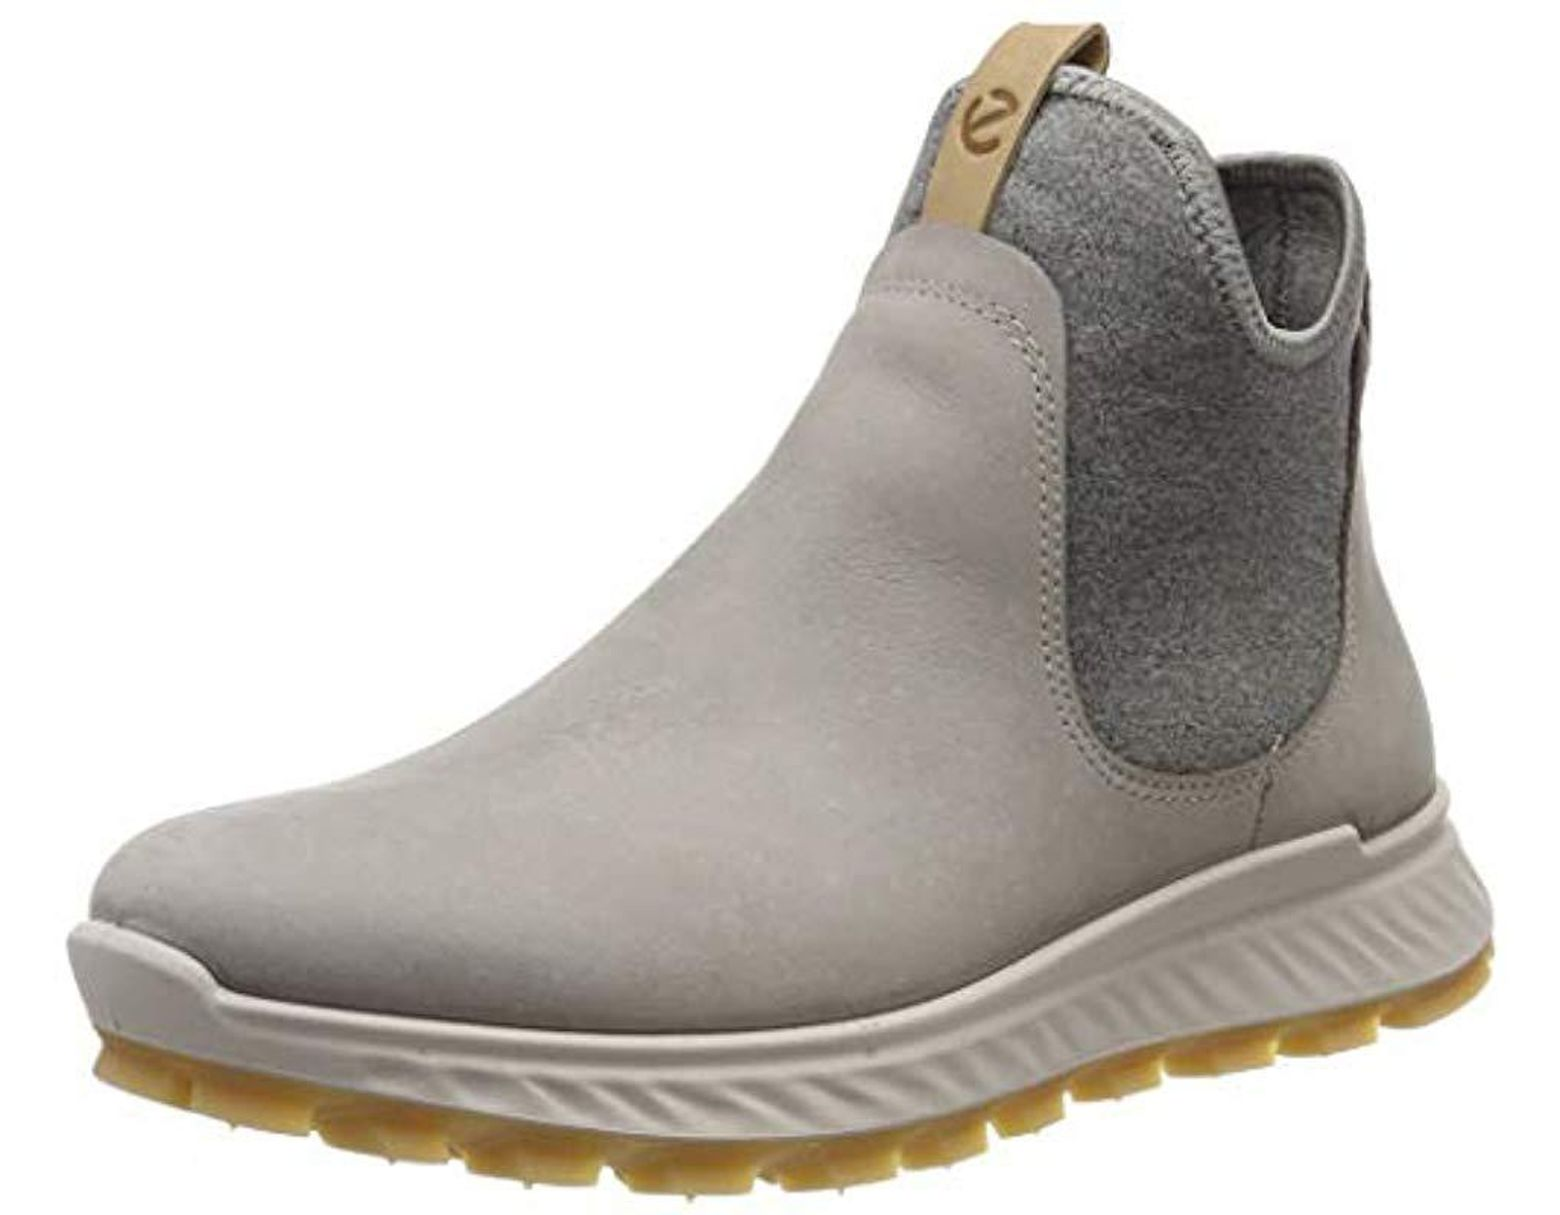 0c3d304374e92 Ecco Exostrike L Chelsea Boots in Gray - Lyst